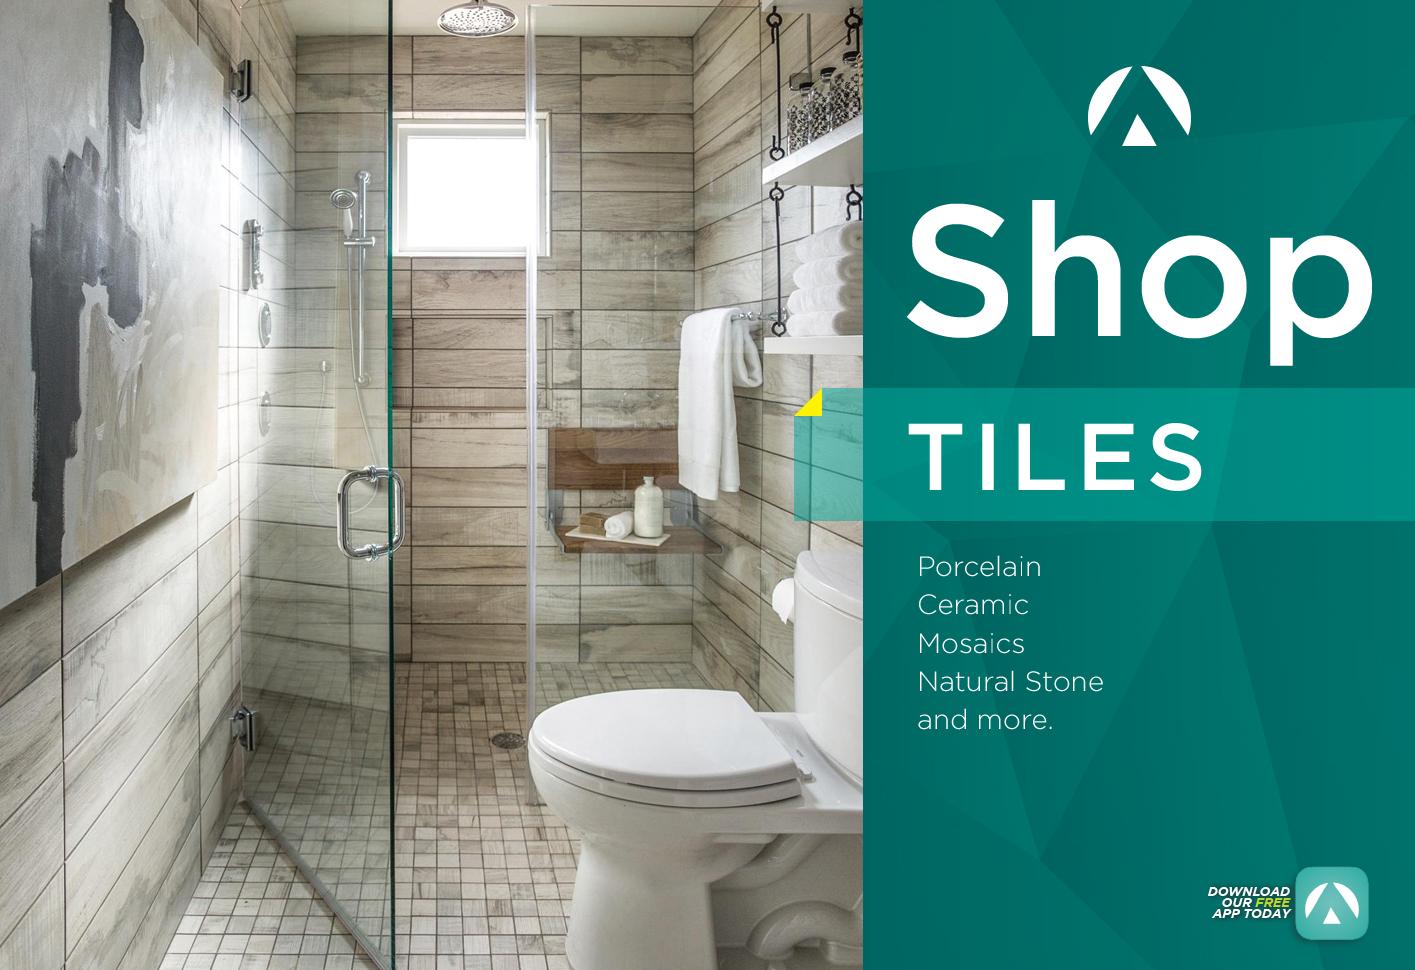 Modern Ative Bathroom Tile Borders Ideas - Bathroom ideas designs ...